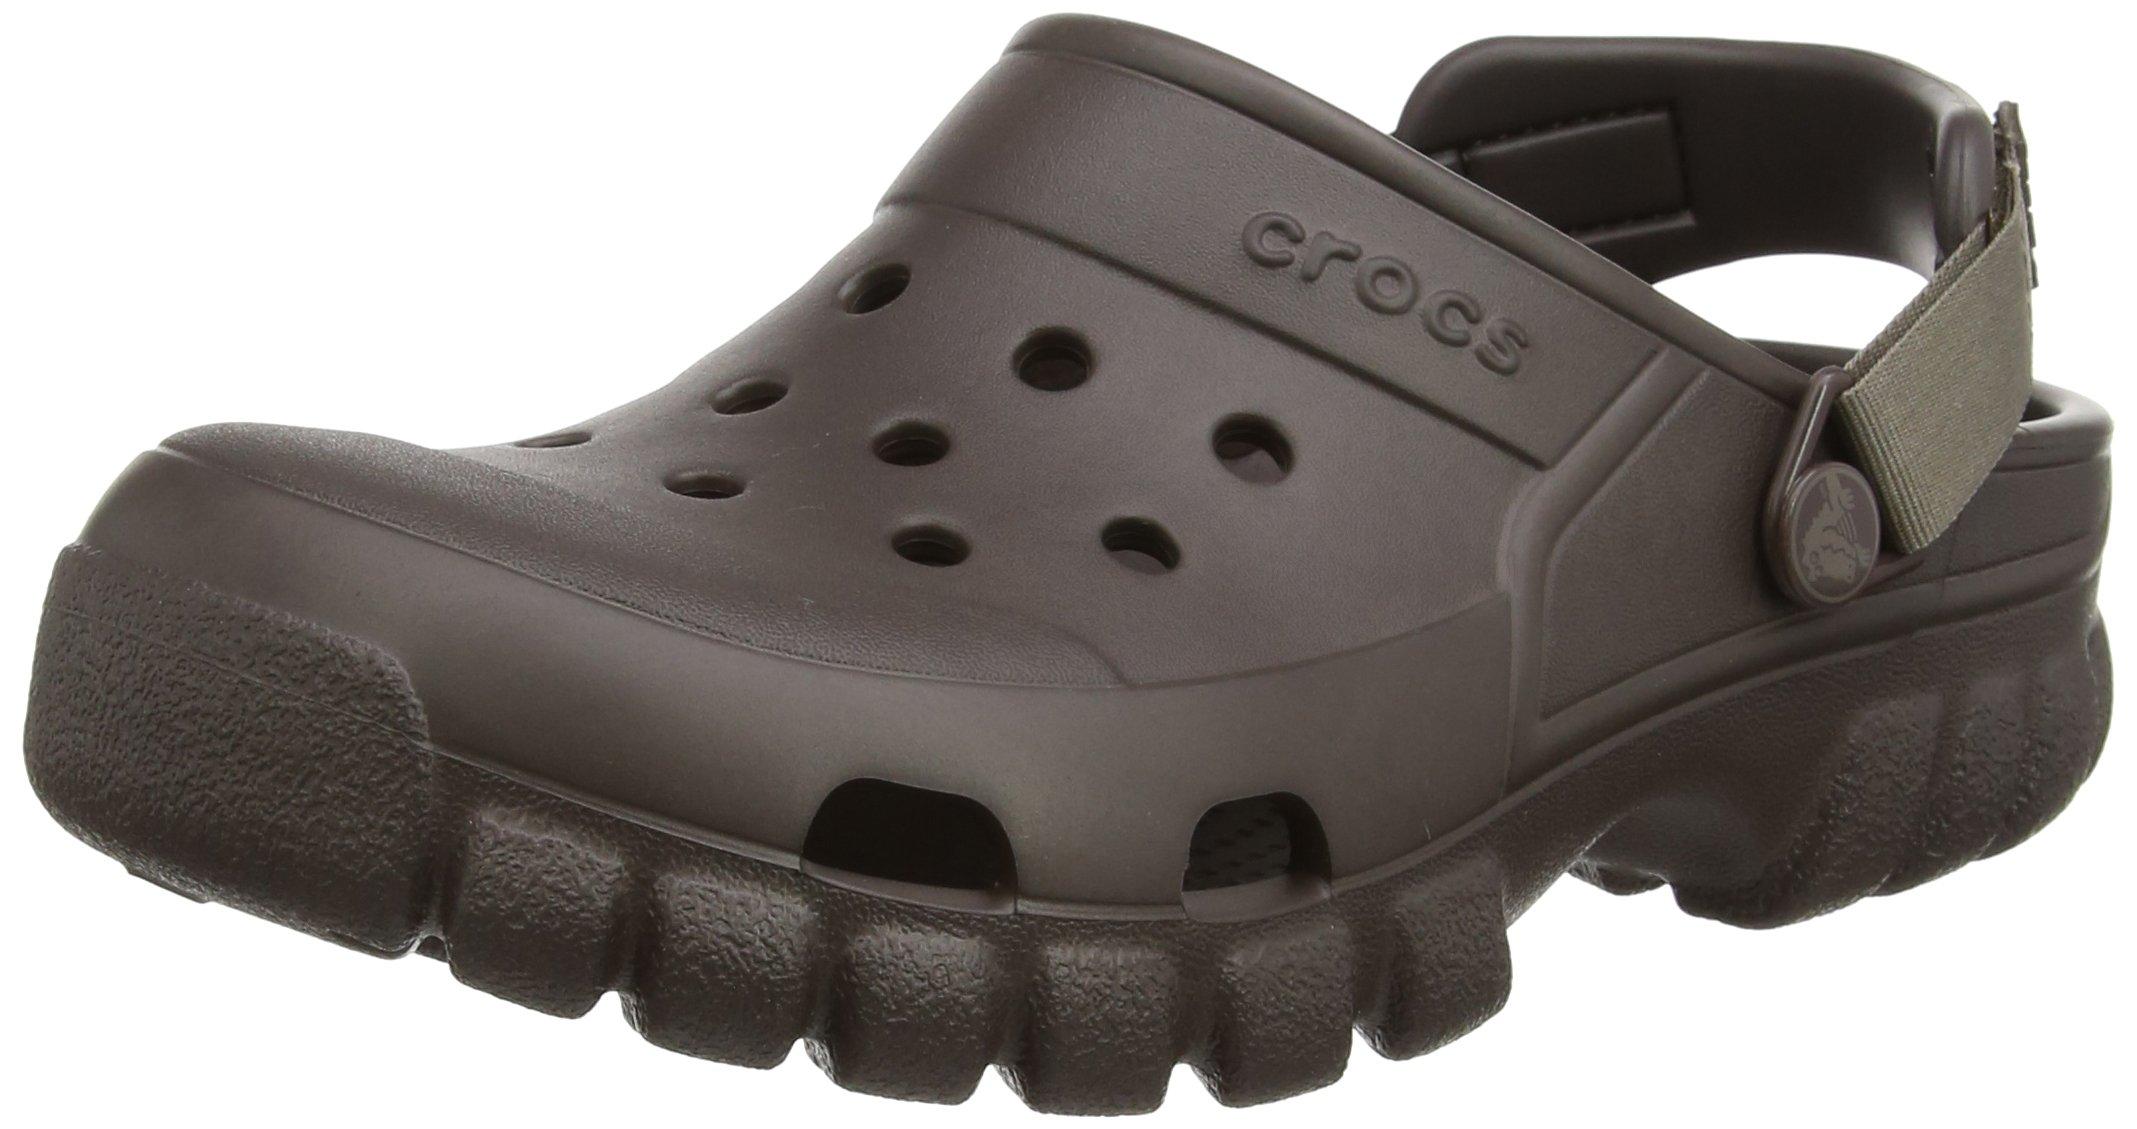 Crocs Unisex Offroad Sport Clog, Espresso/Walnut, 12 M (D) US Men's/14 M (B) US Women